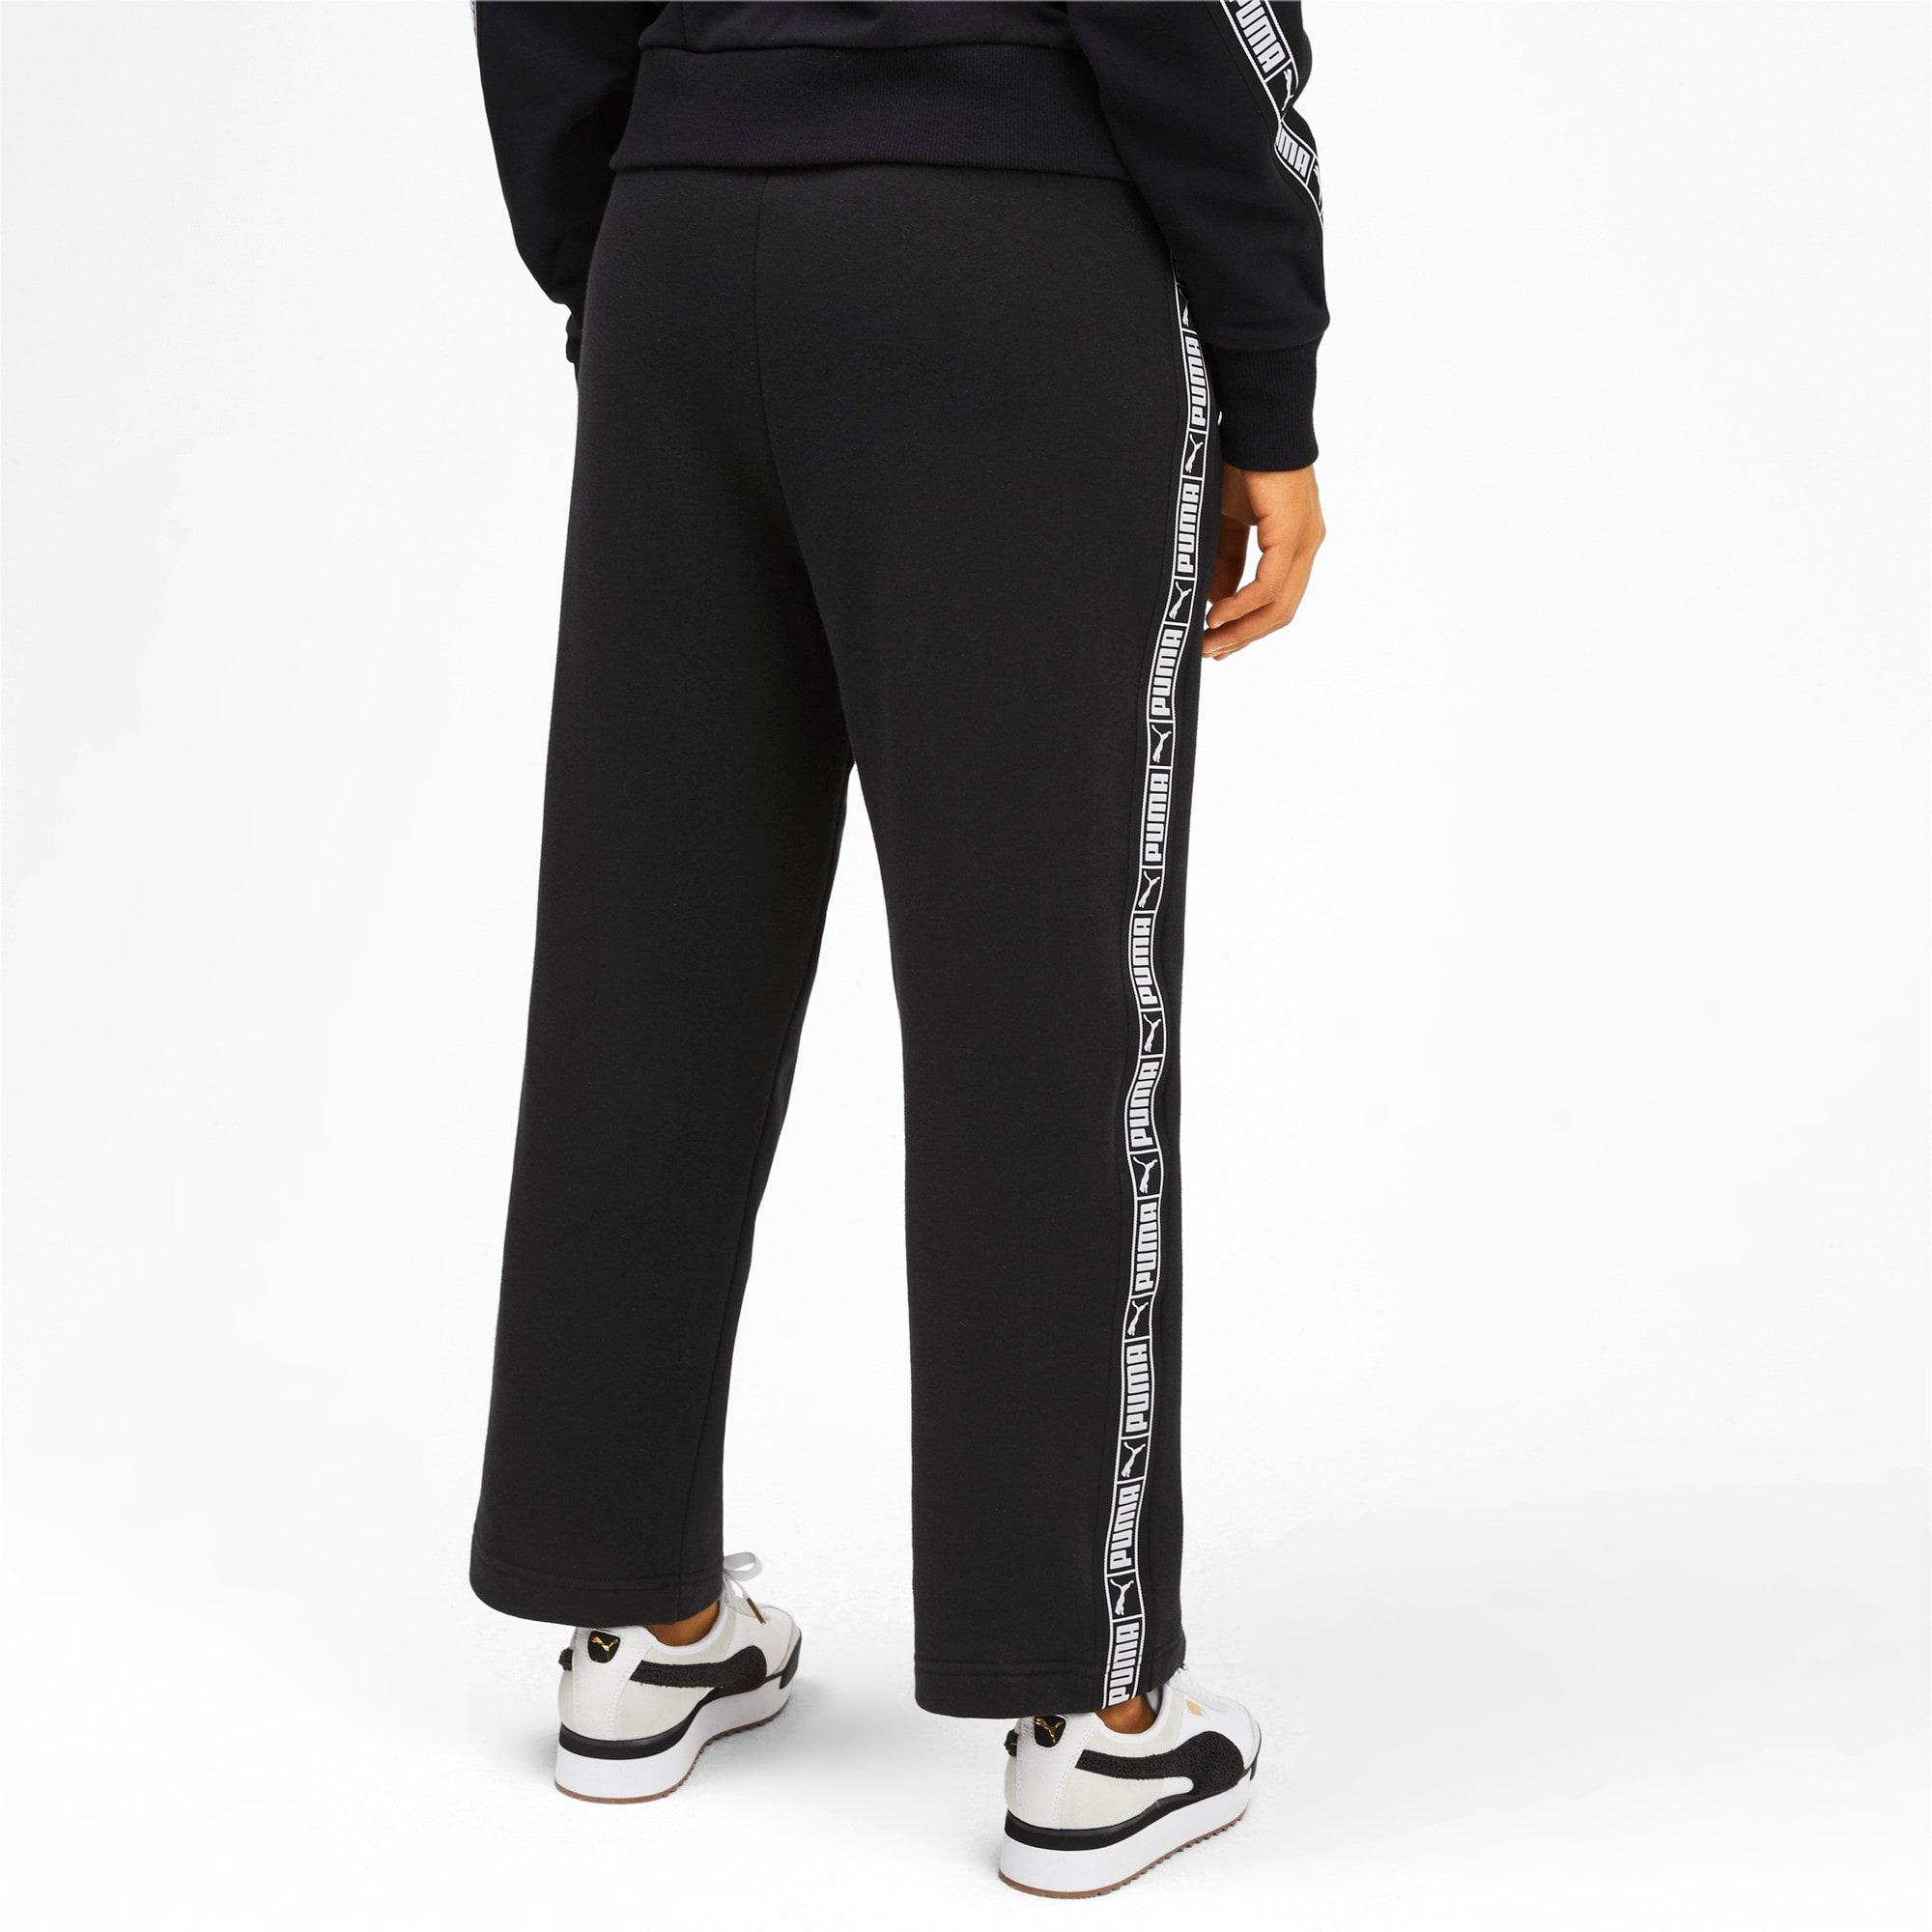 Thumbnail 3 of Classics Women's Track Pants, Puma Black, medium